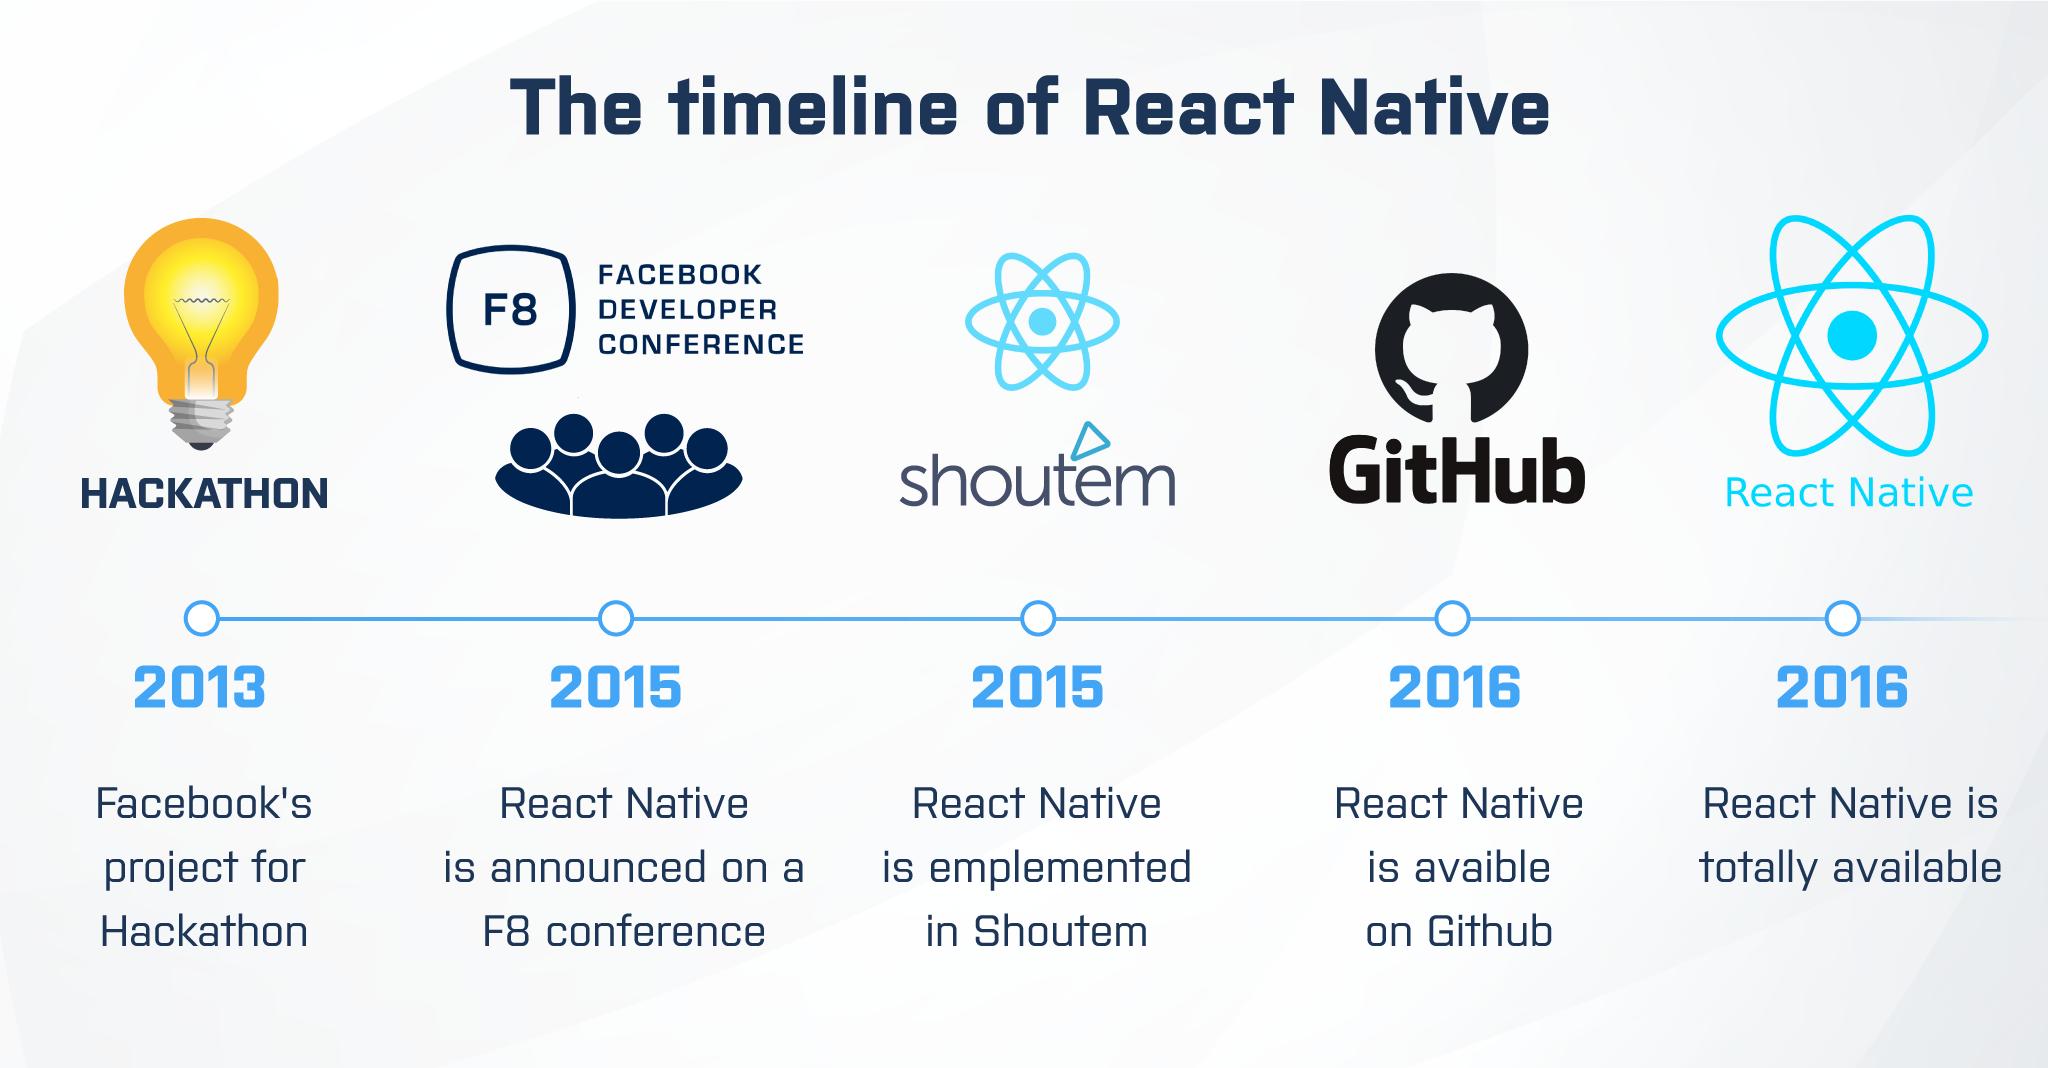 react native app development timeline